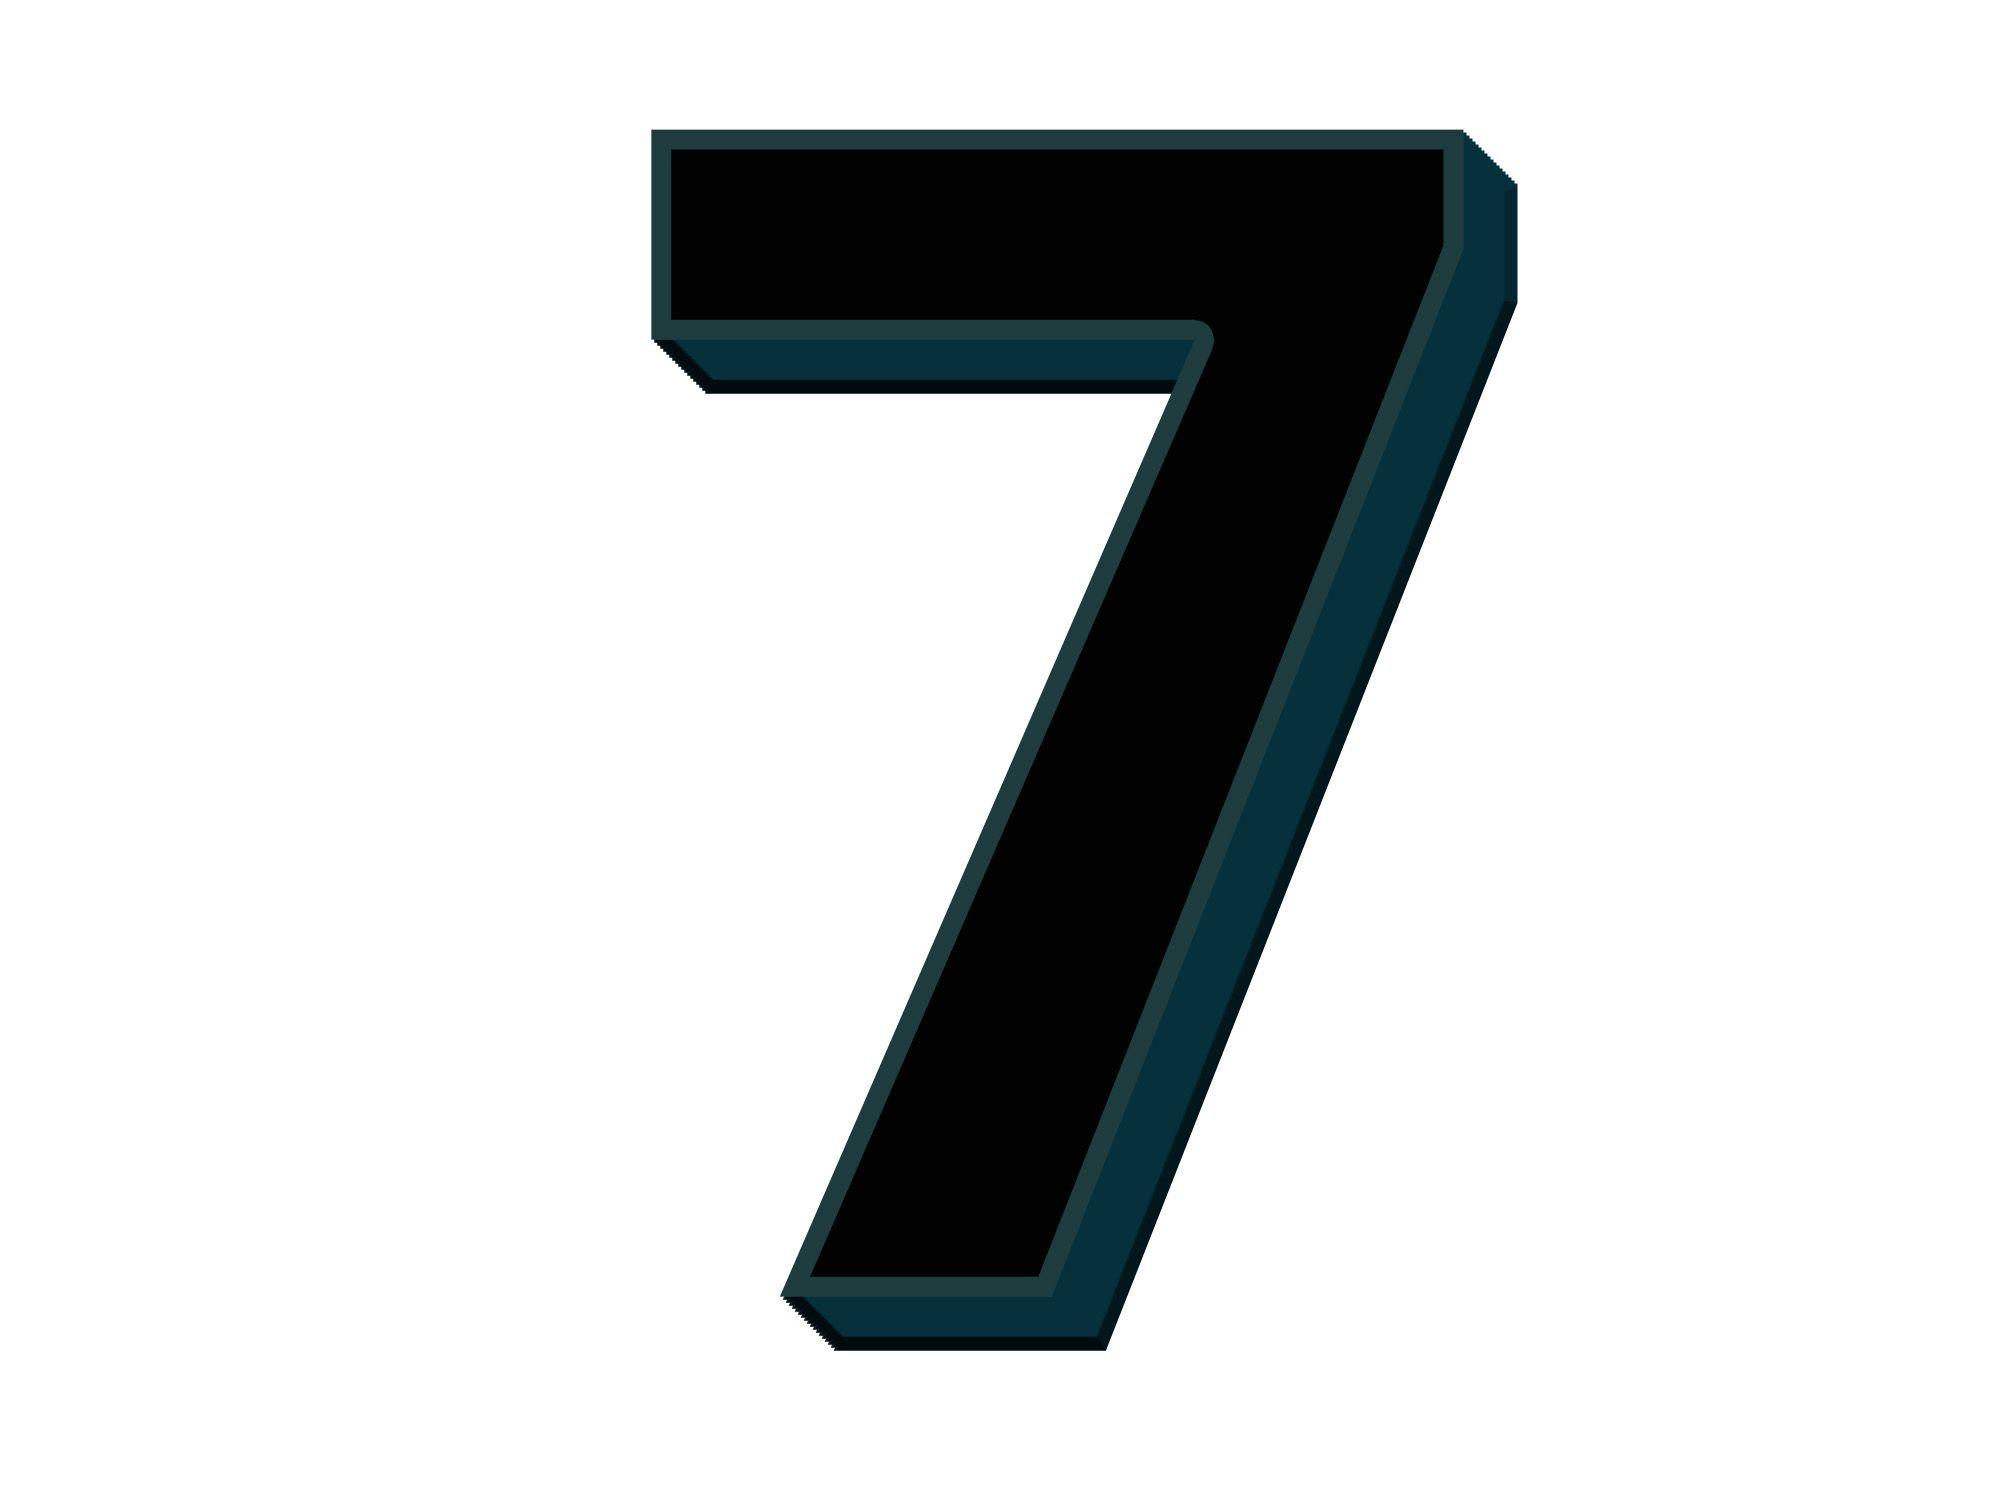 Radix Number 7